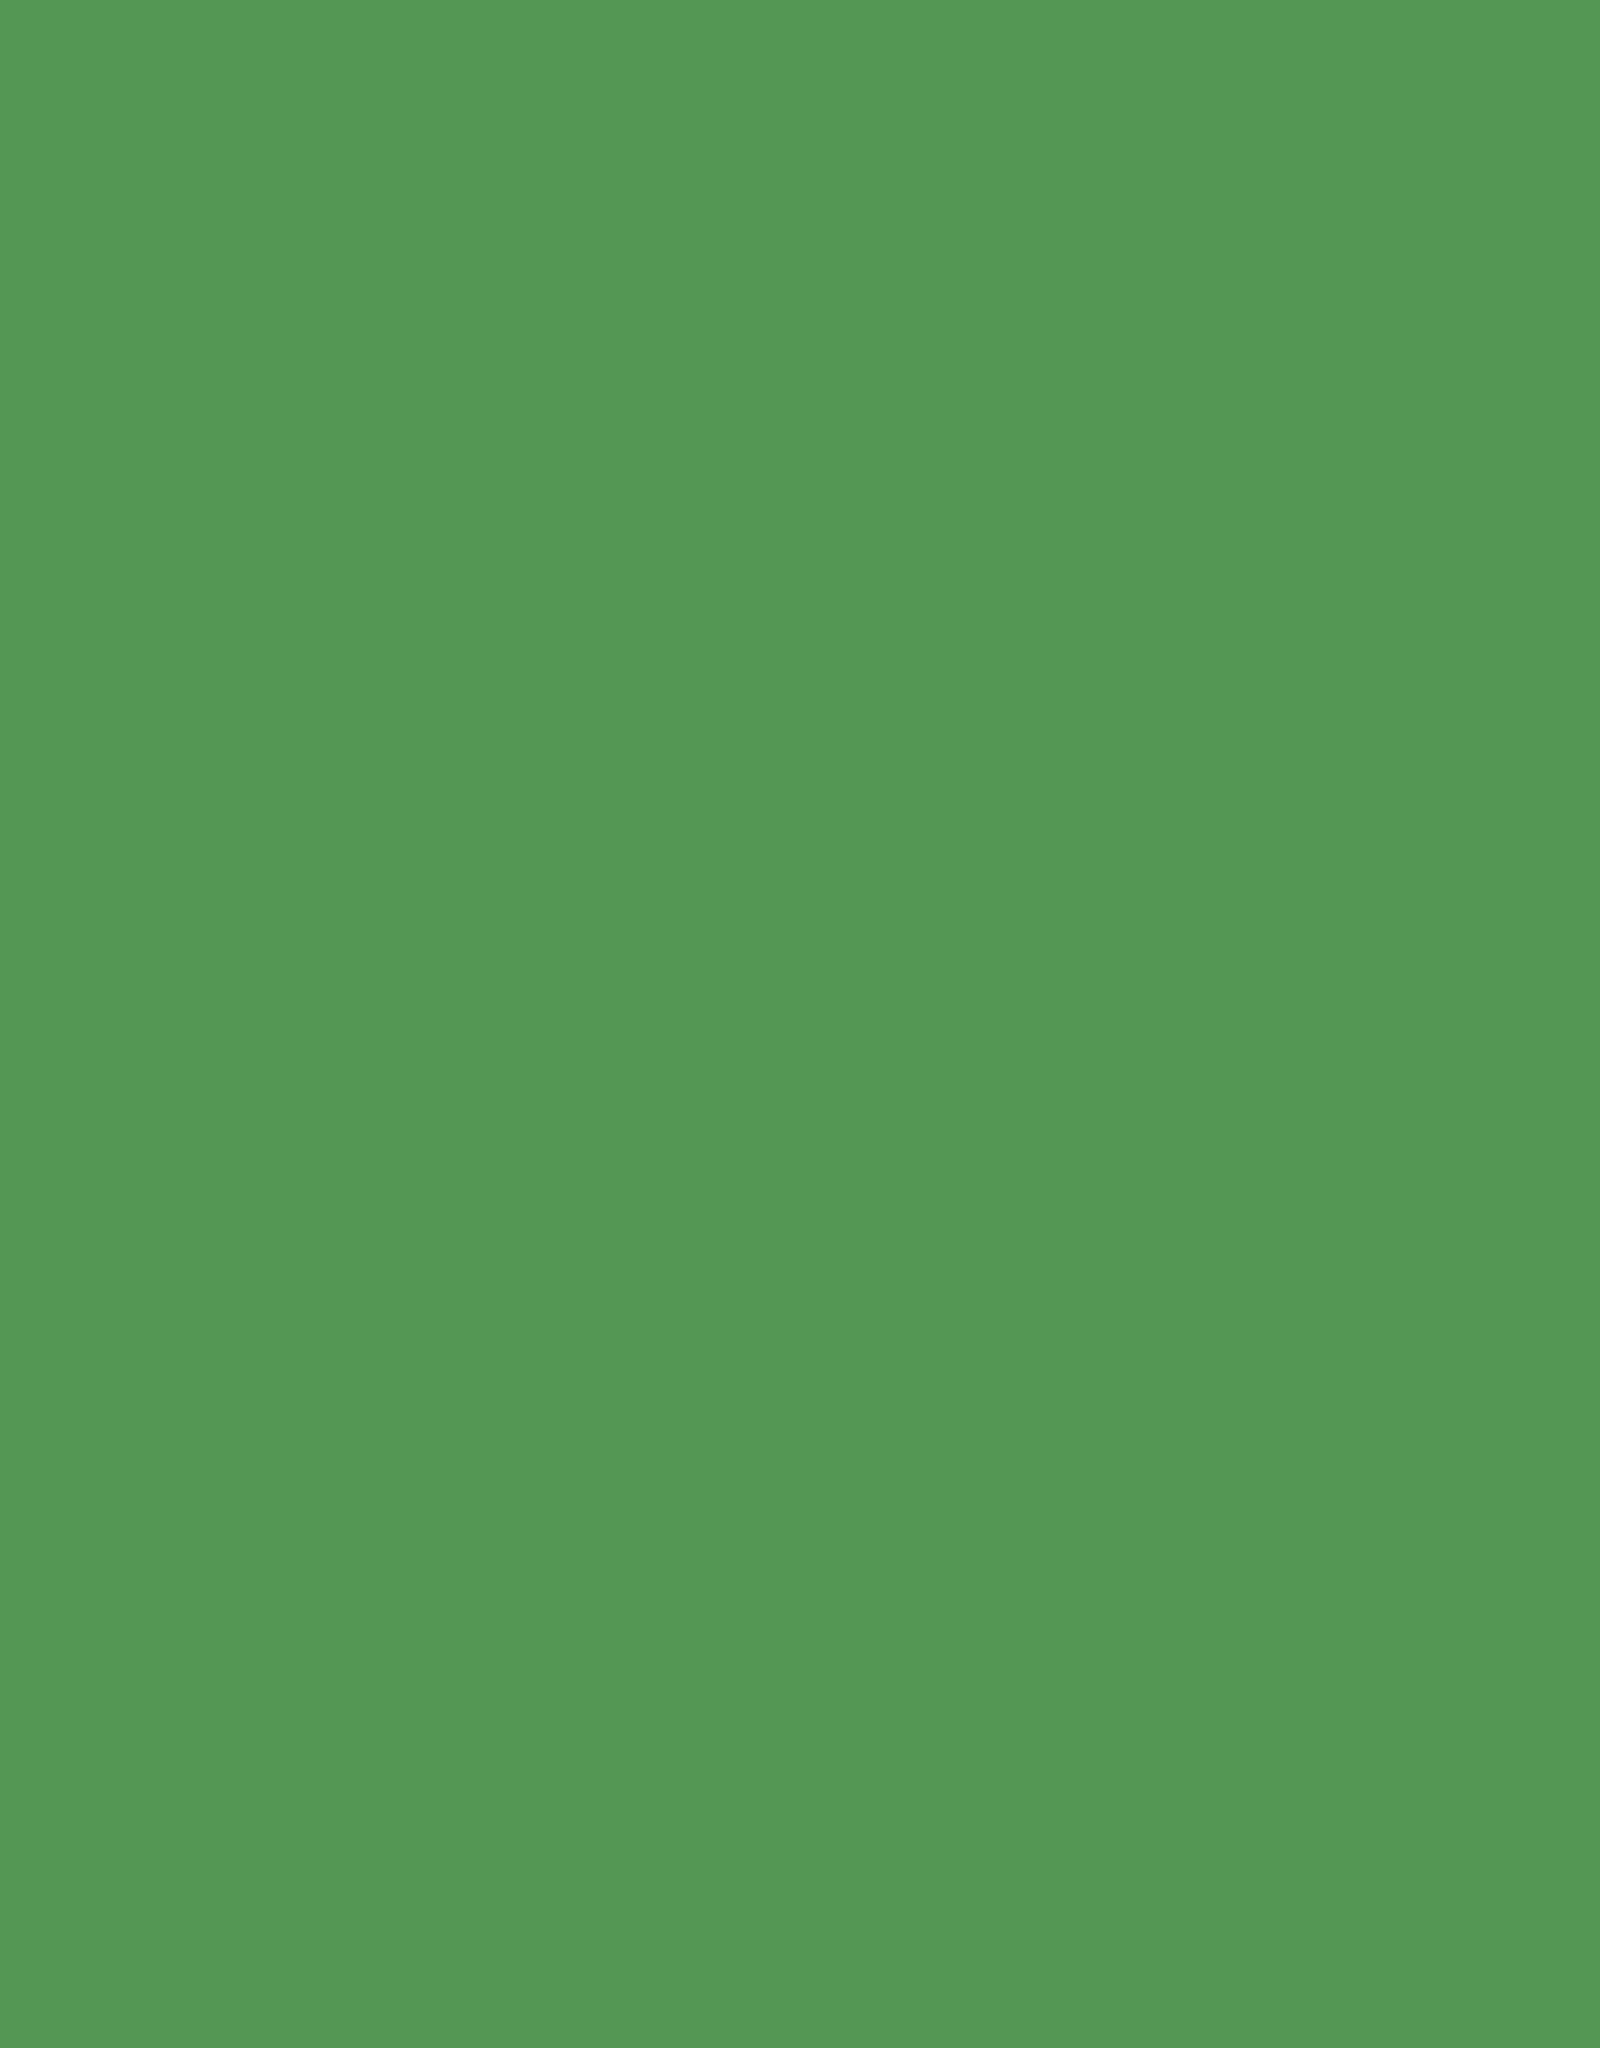 Superior Seamless Superior Seamless 9' Stinger #54 (Chroma Key compatible)